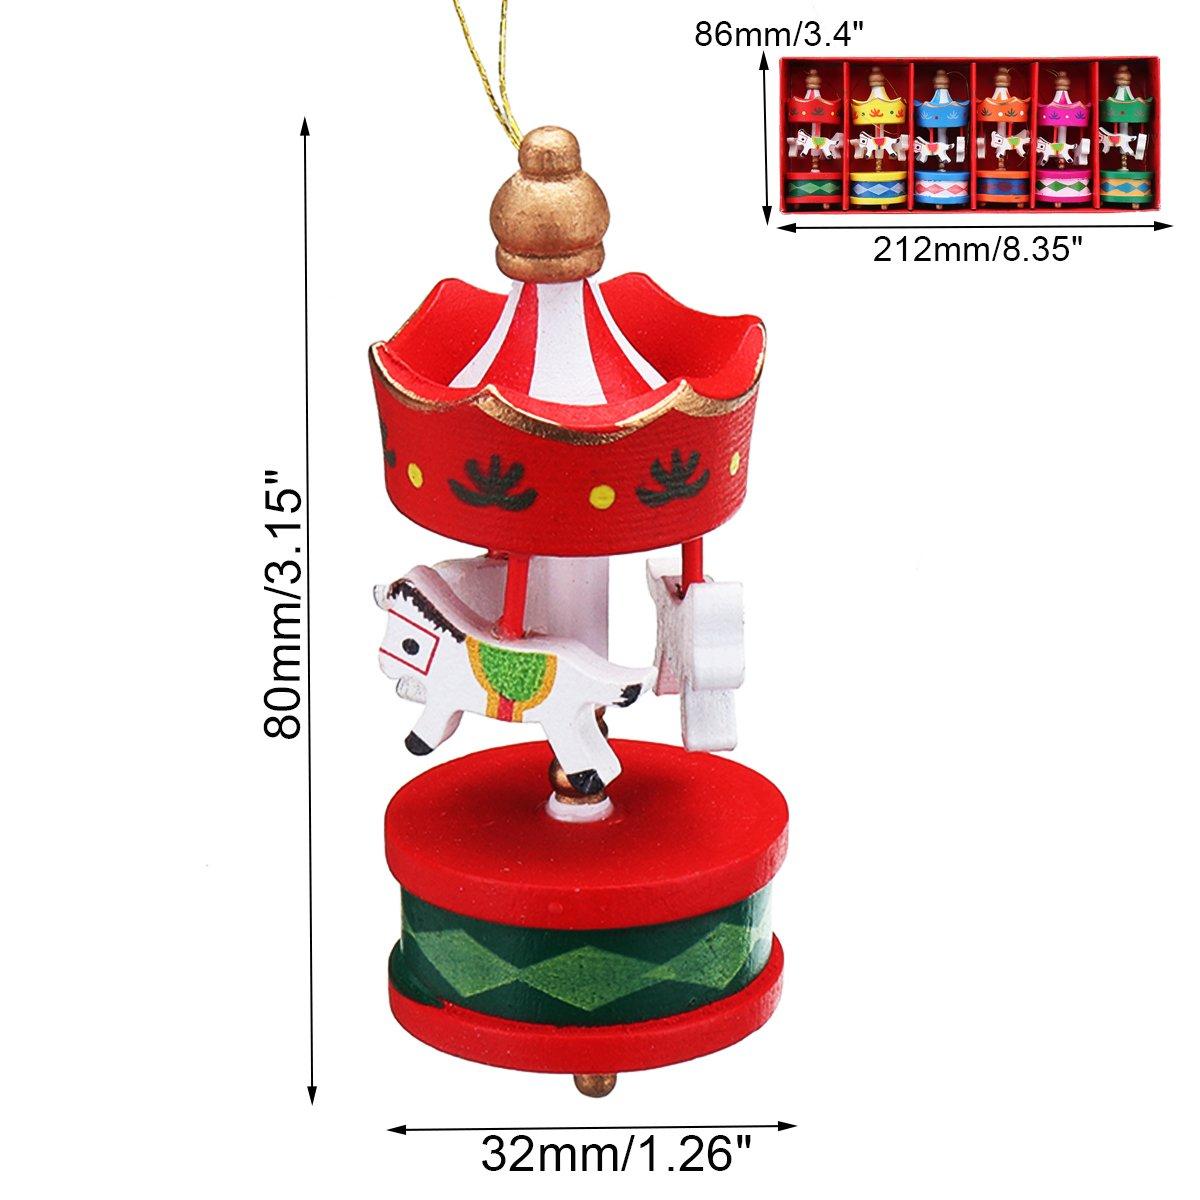 Jeteven 6er Set Geburtstagfeier Anhänger Mini Karussell Pferd Holz Basteln Valentinstag Deko für Kinder Mädchen Holzanhänger Geburtstag Geschenk Rot